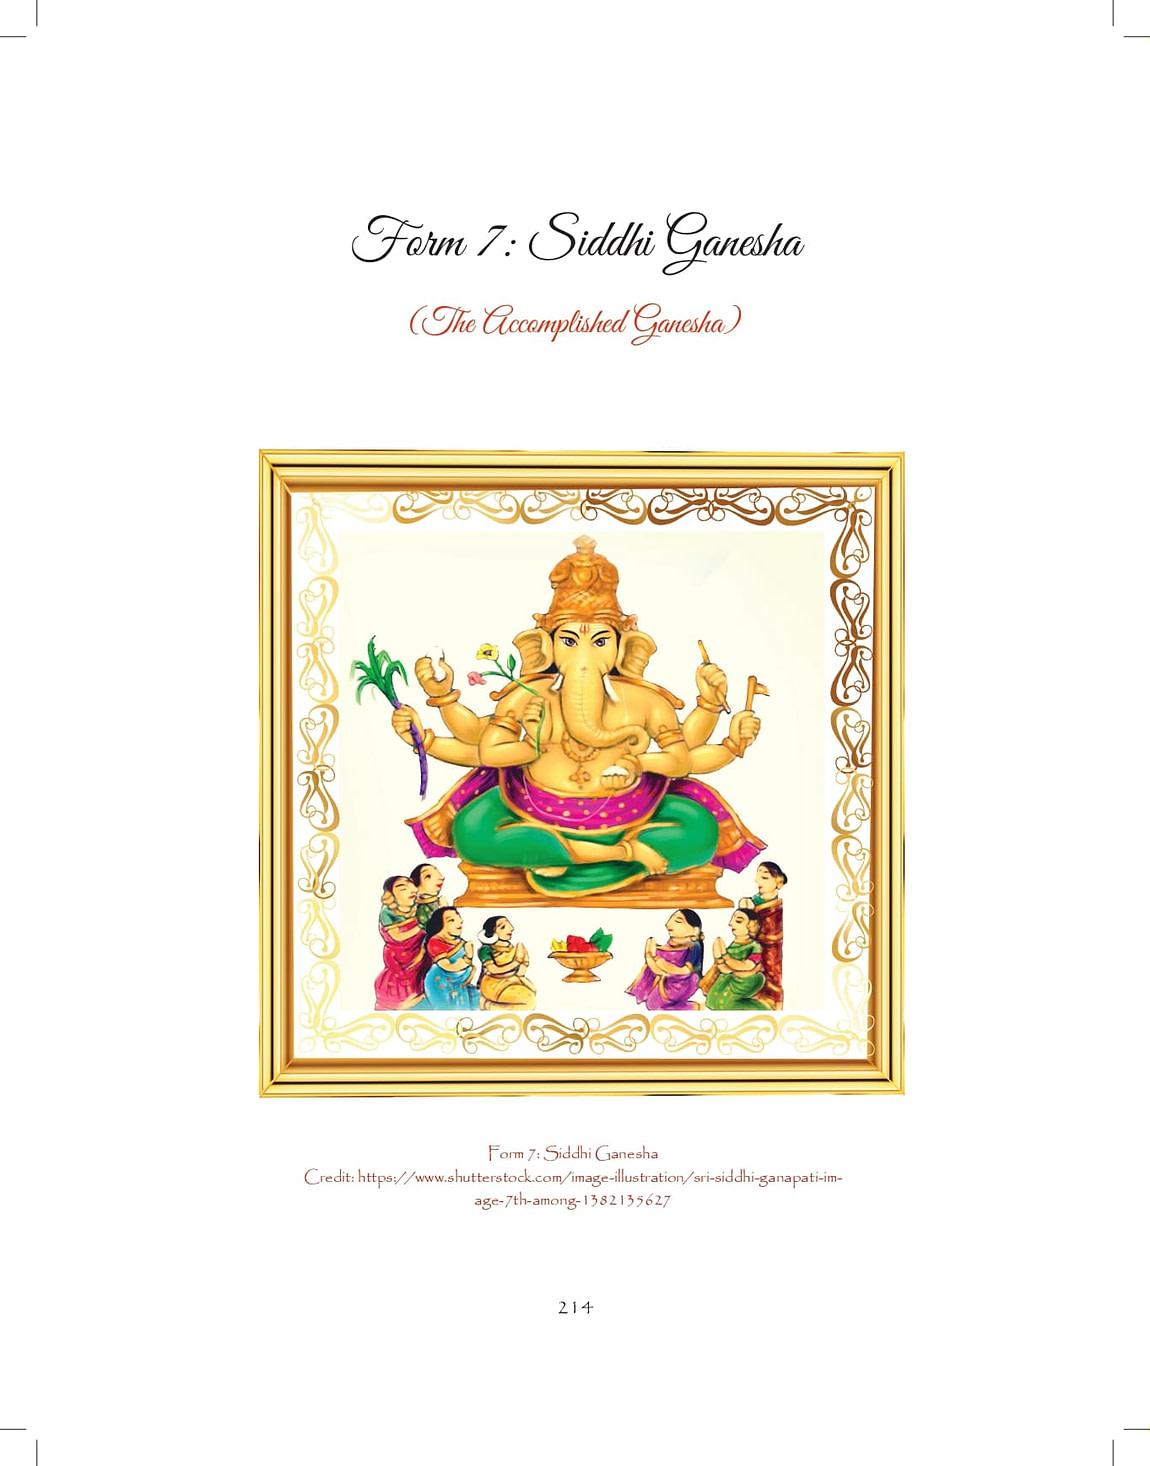 Ganesh-print_pages-to-jpg-0214.jpg